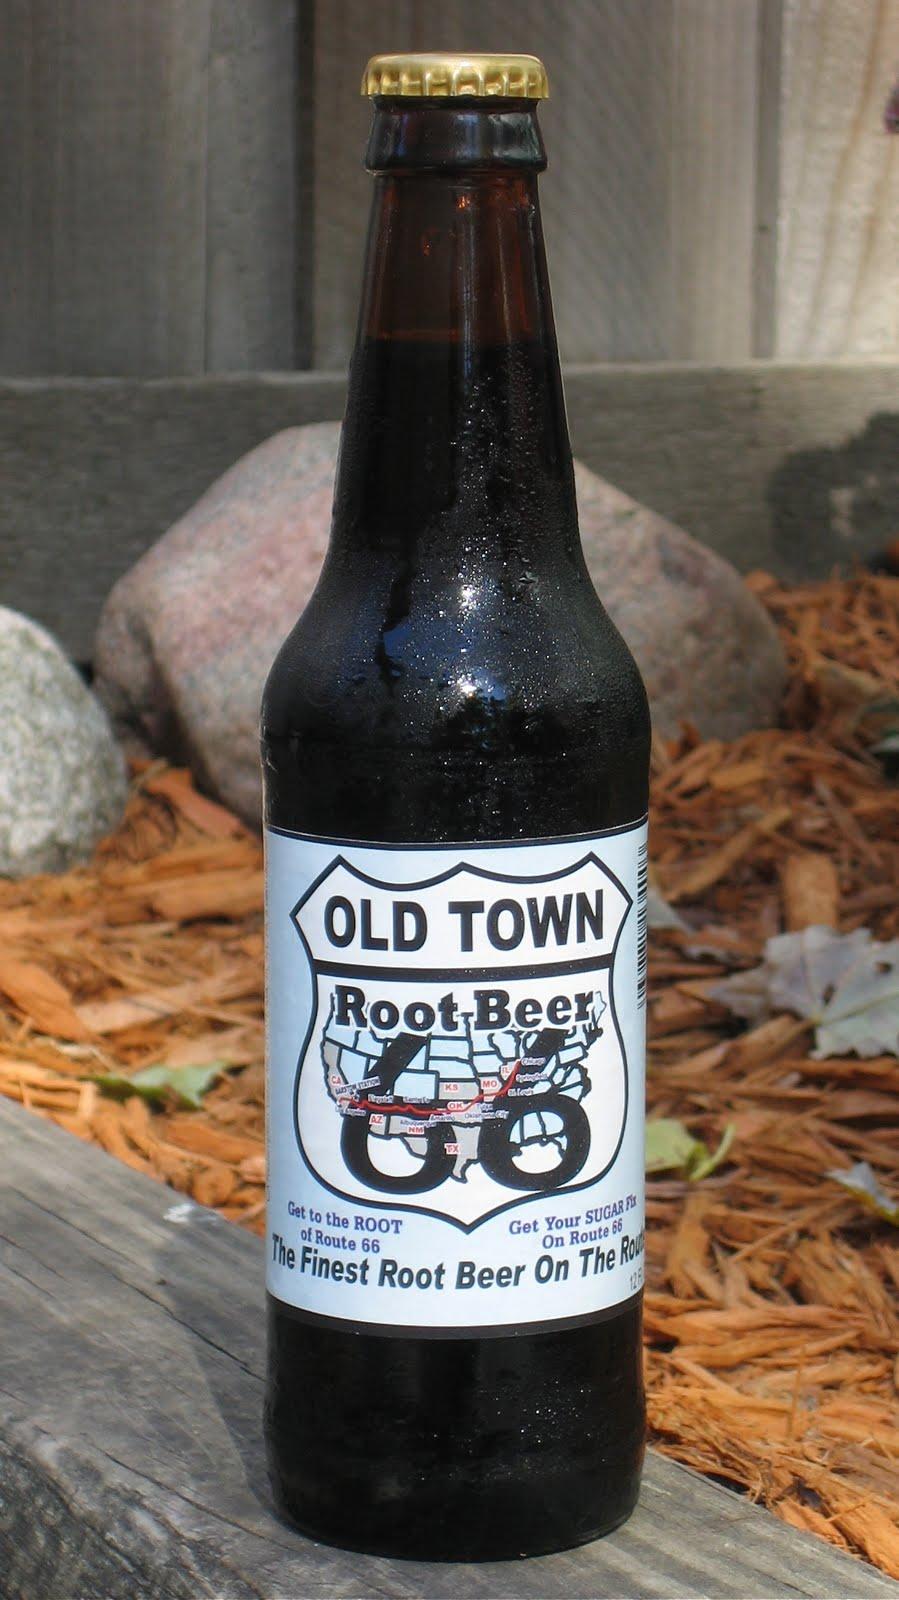 Old Town Root Beer